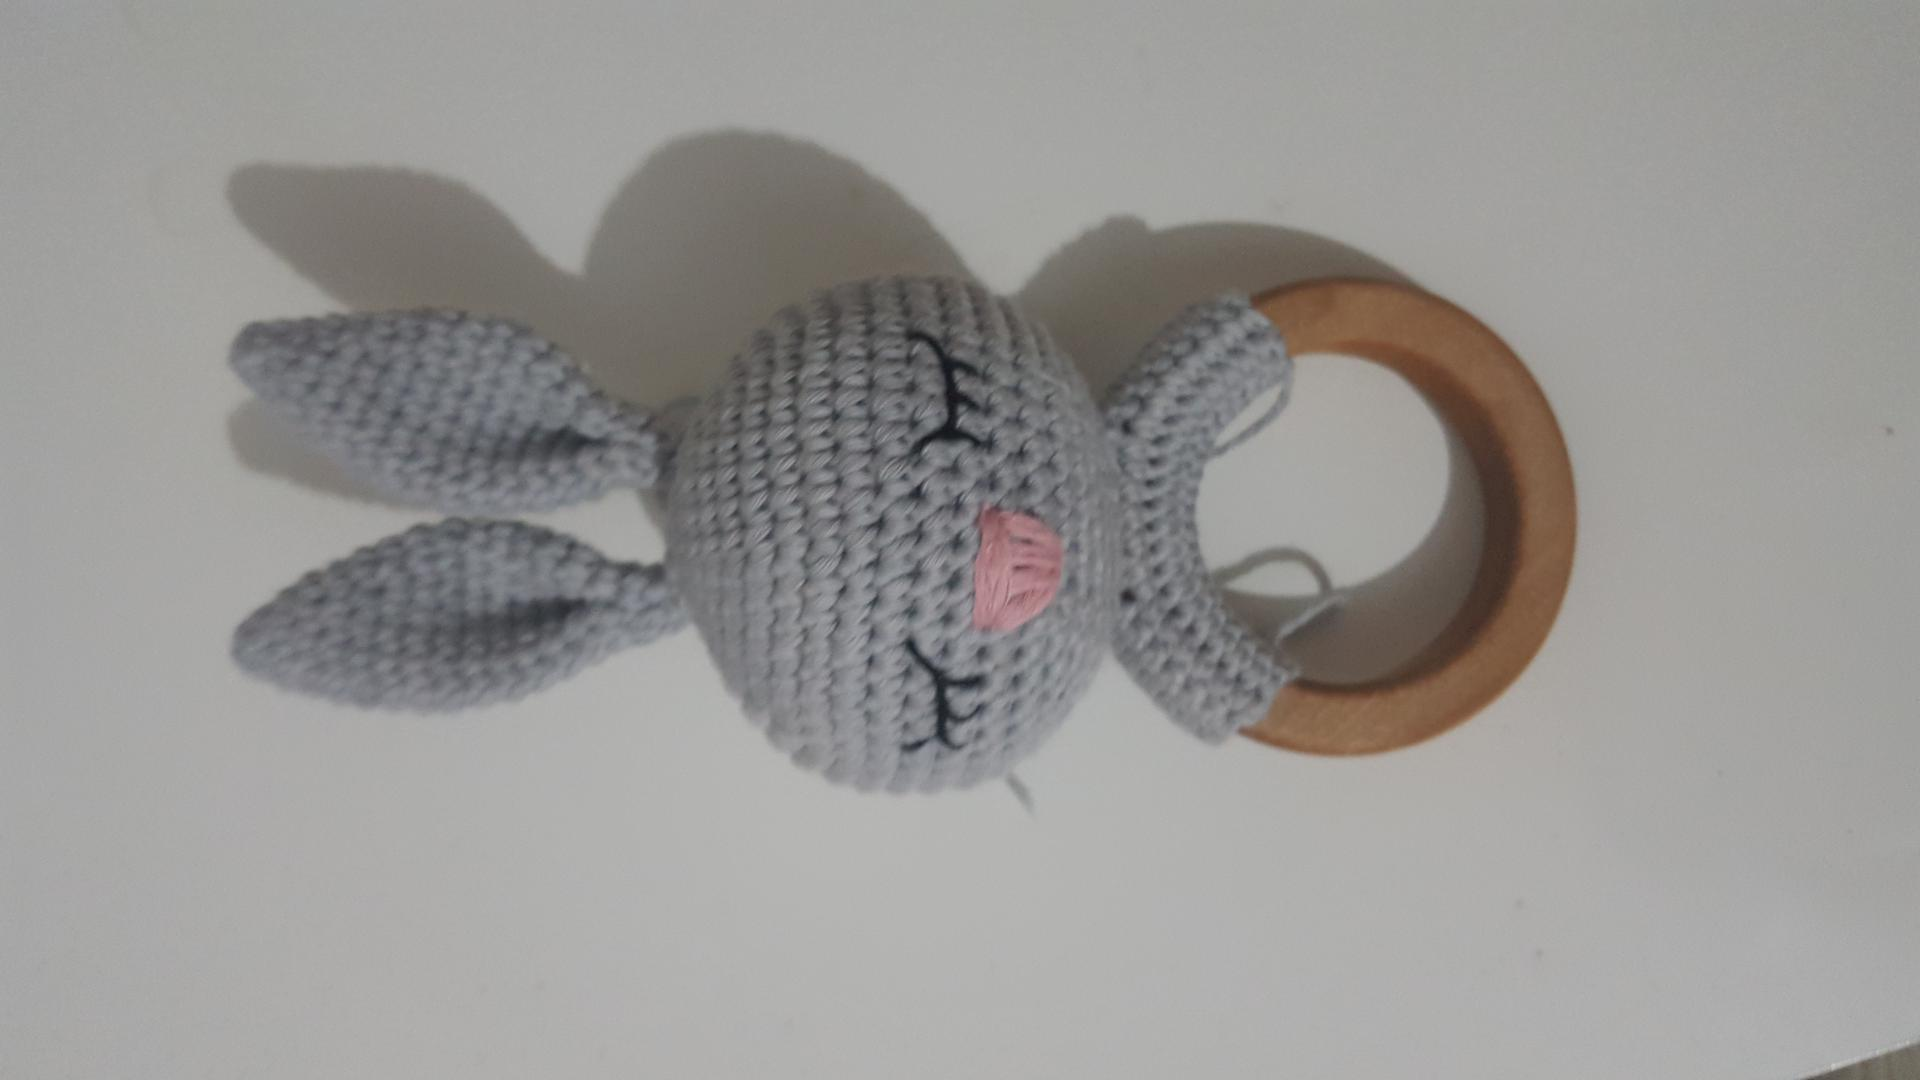 ŞAPKA YAKA EMZİK CEP) amigurumi karpuz bebek tarifi ... | 1080x1920